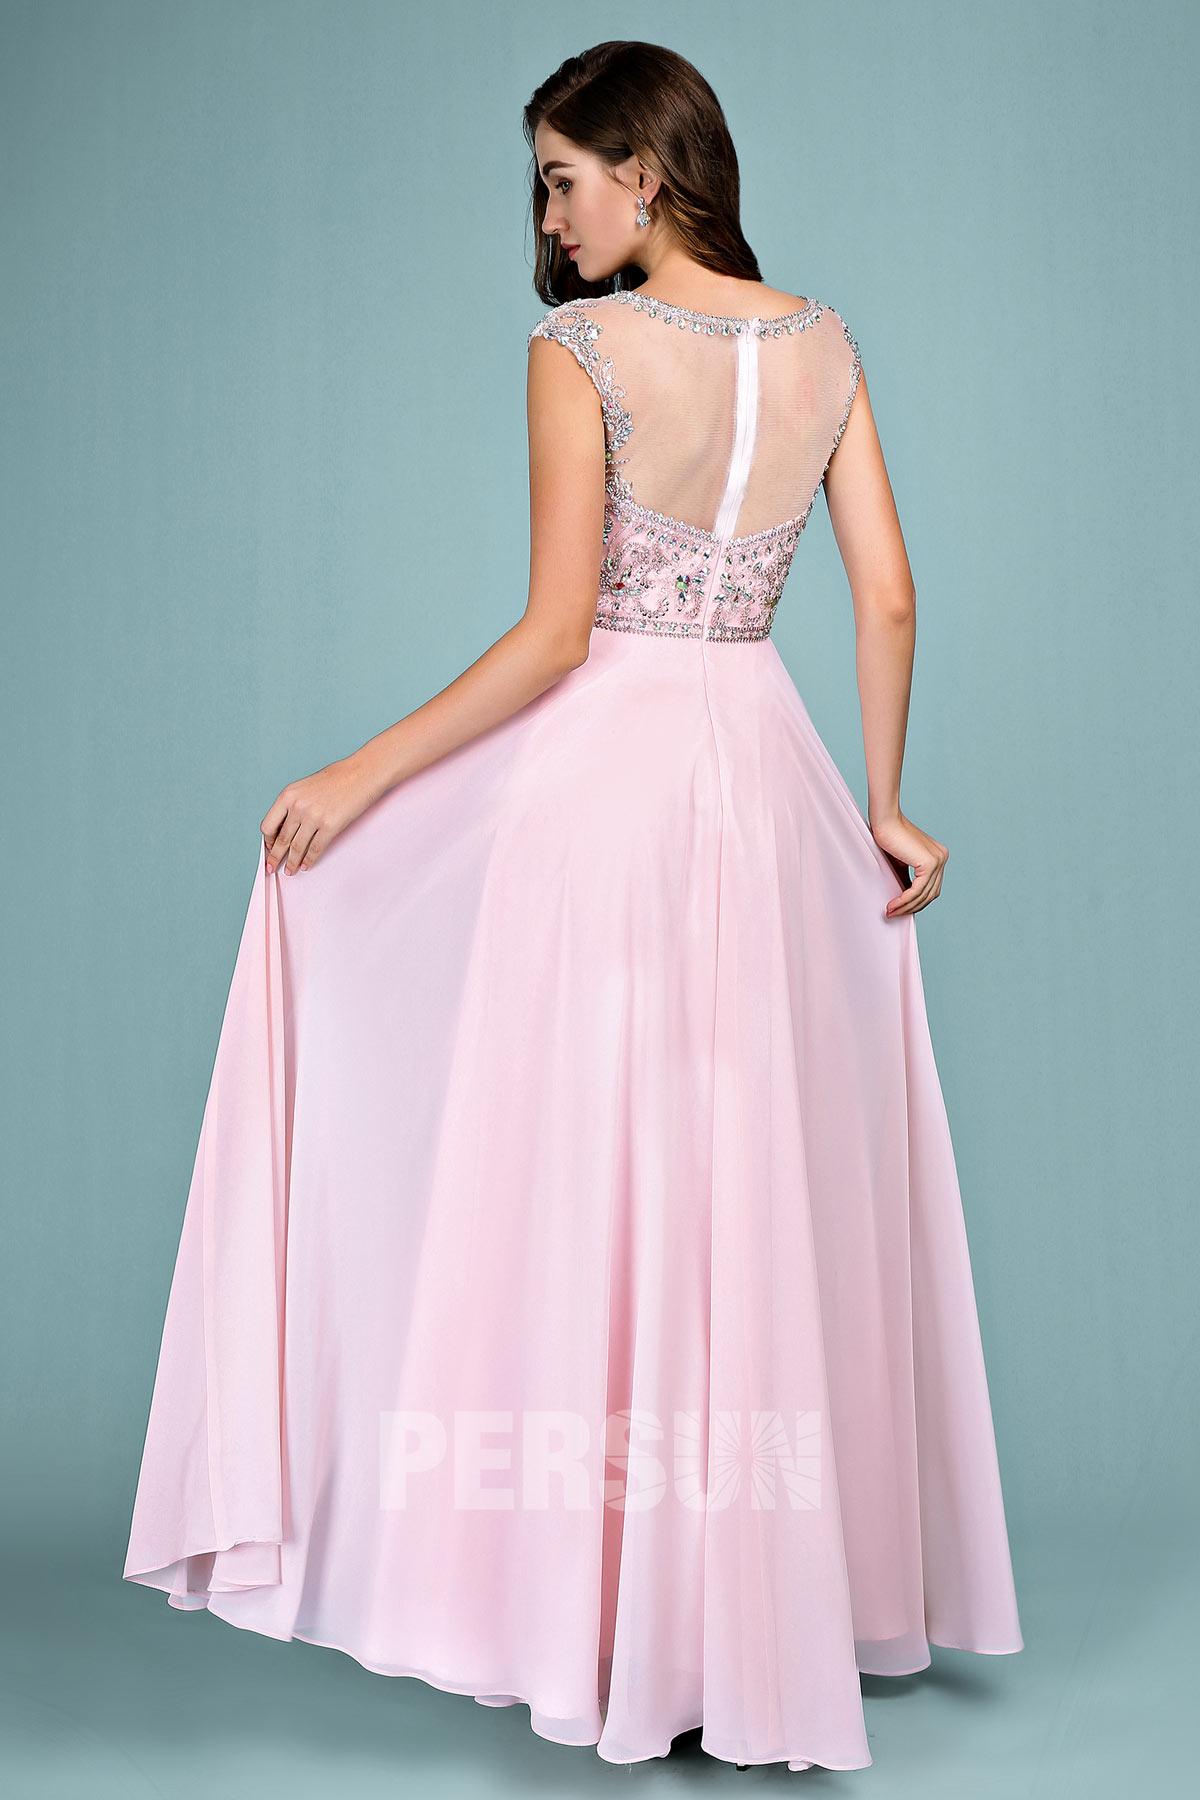 Robe de gala rose longue haut embelli de bijoux jeu transparent